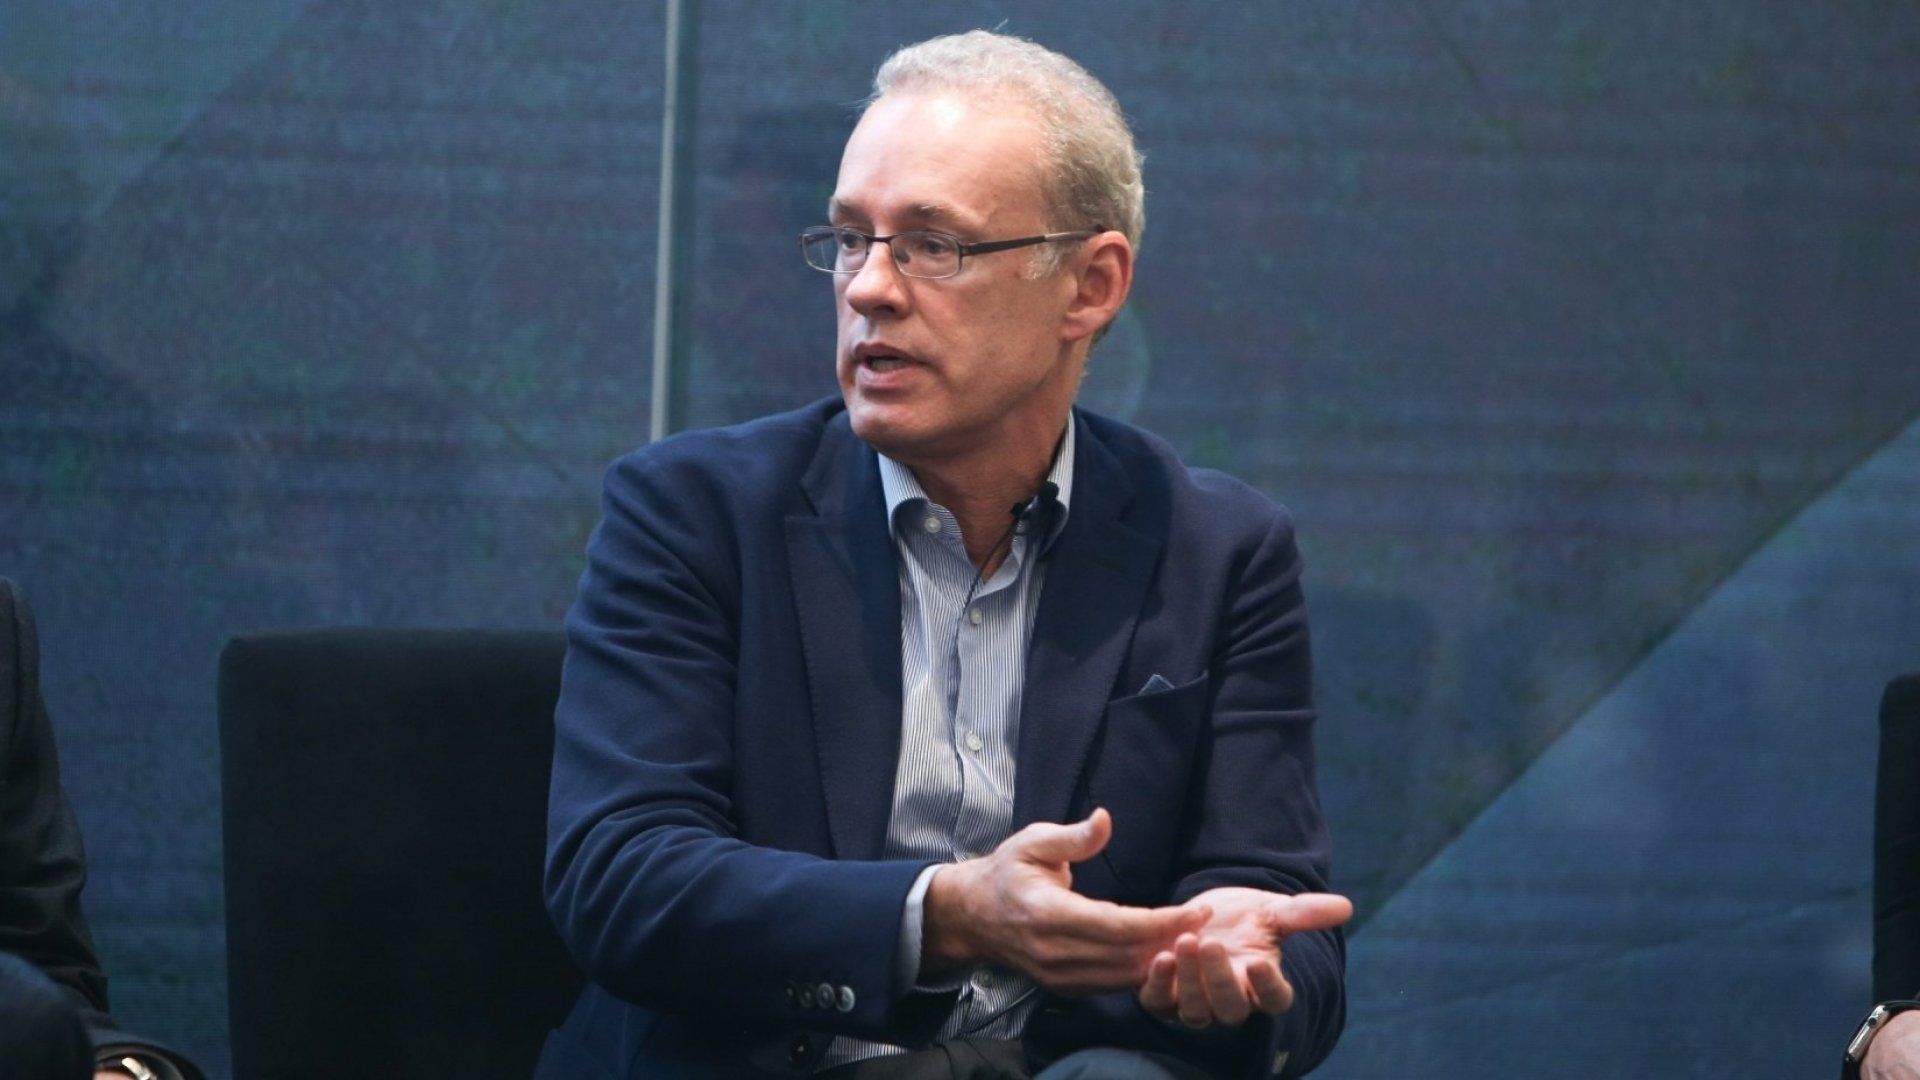 Chairman & Founder of GILT, Business Insider, MongoDB and Zola Kevin P. Ryan.